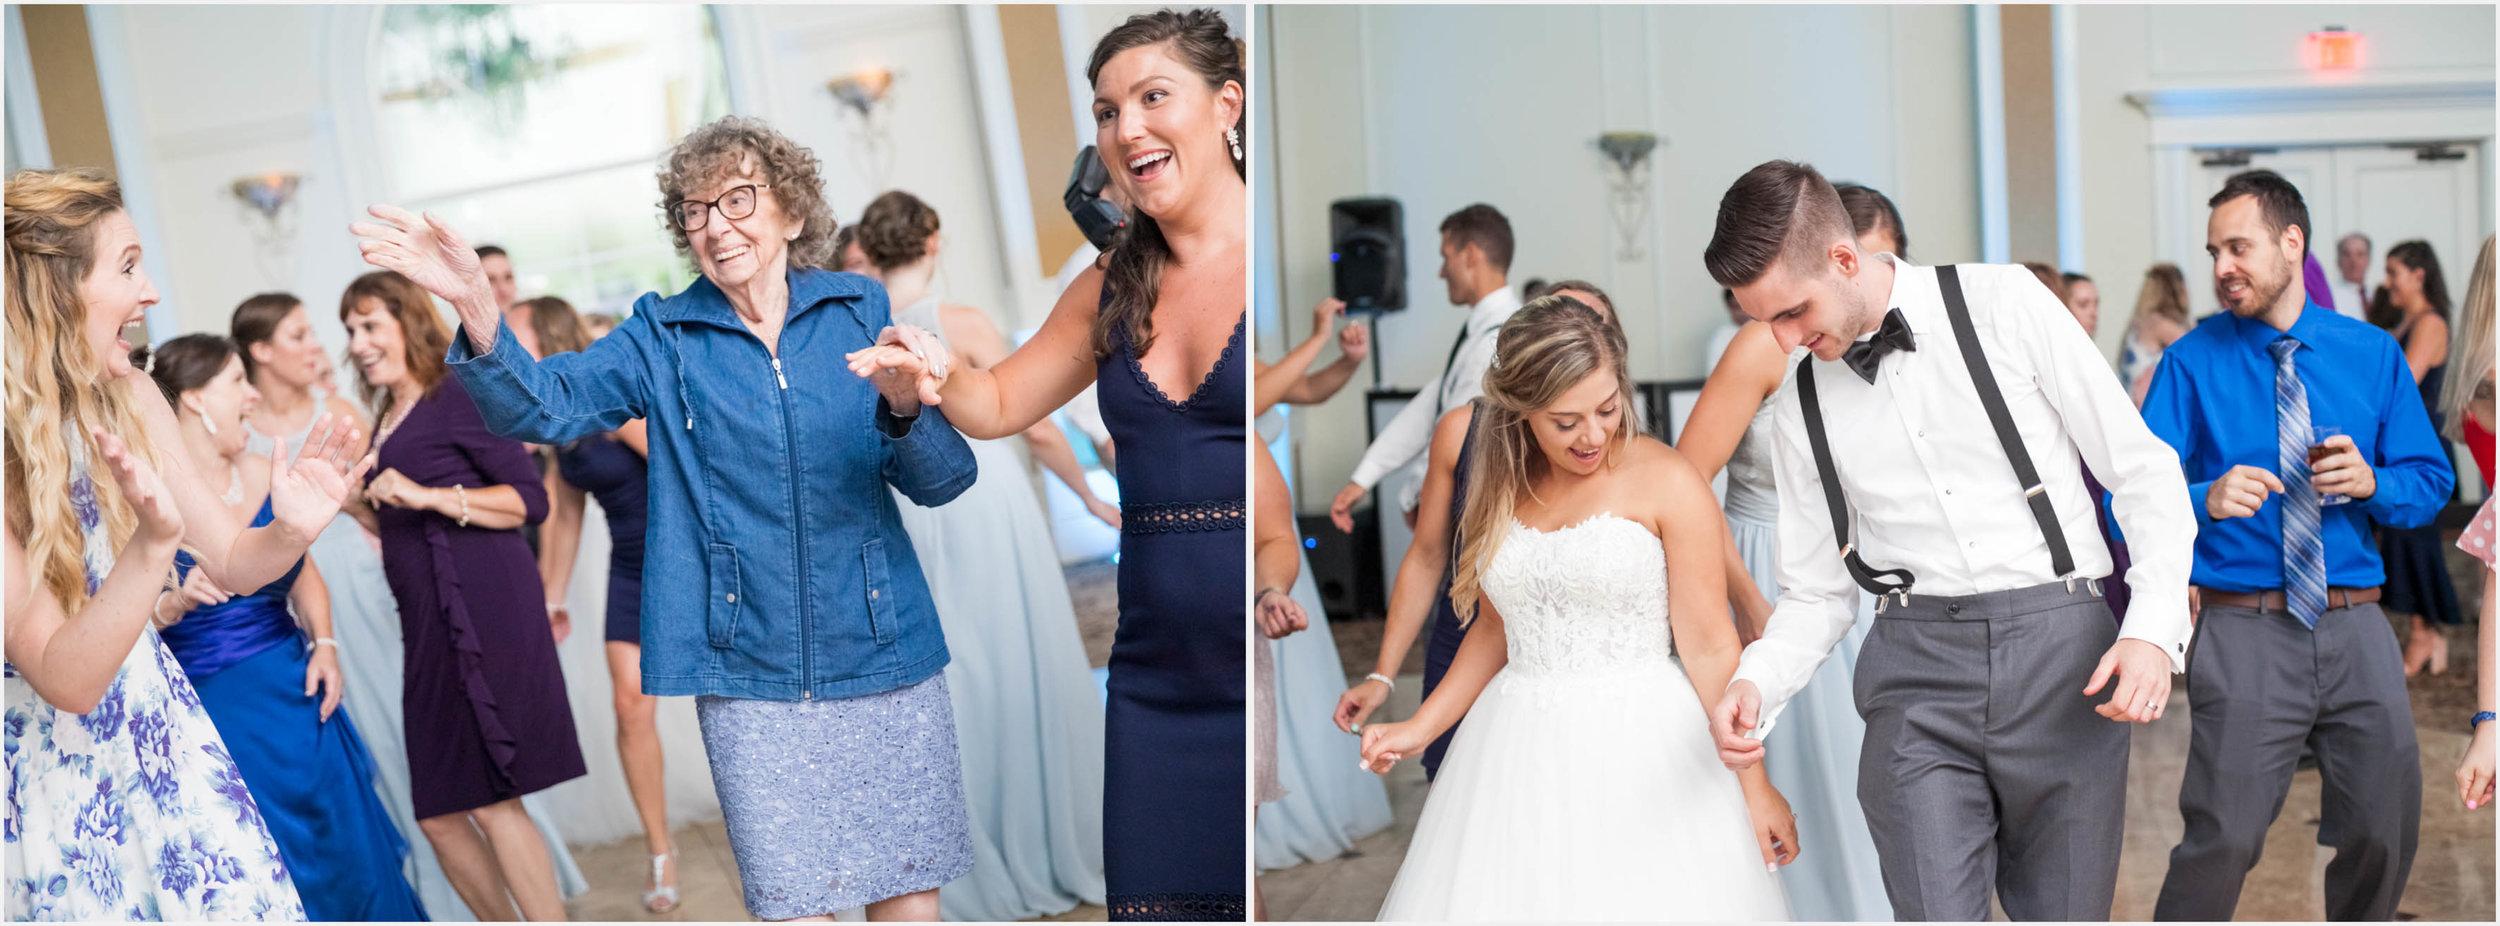 Cassondre Mae Photography Hudson Valley NY Wedding Photographer -33.jpg